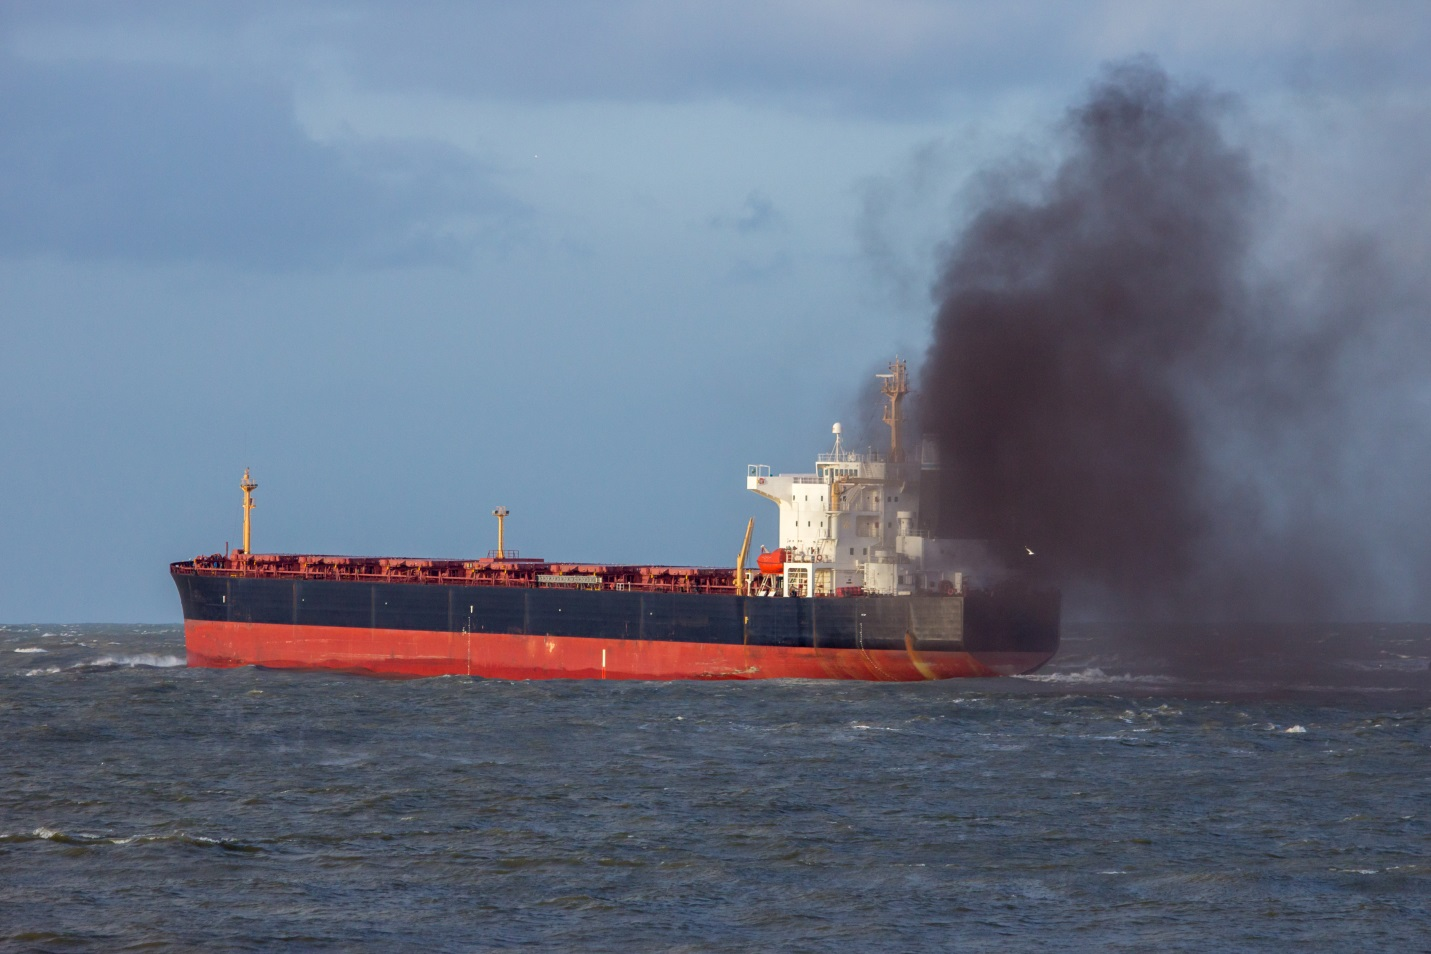 https://shipping-news.marineonline.com/wp-content/uploads/2020/09/European-Union.jpg